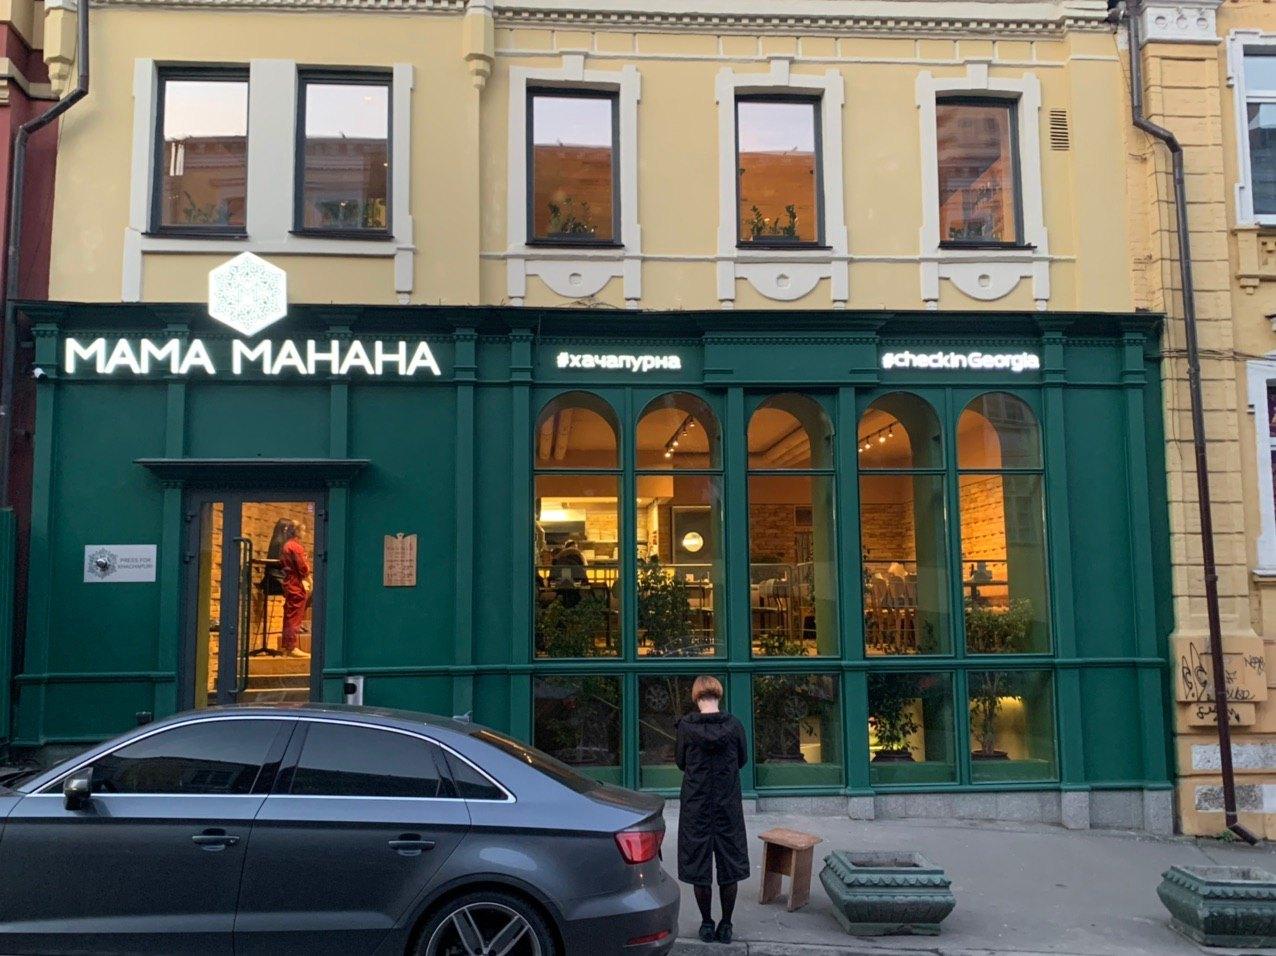 MamaManana-Proreznaya - Мама Манана Прорезная